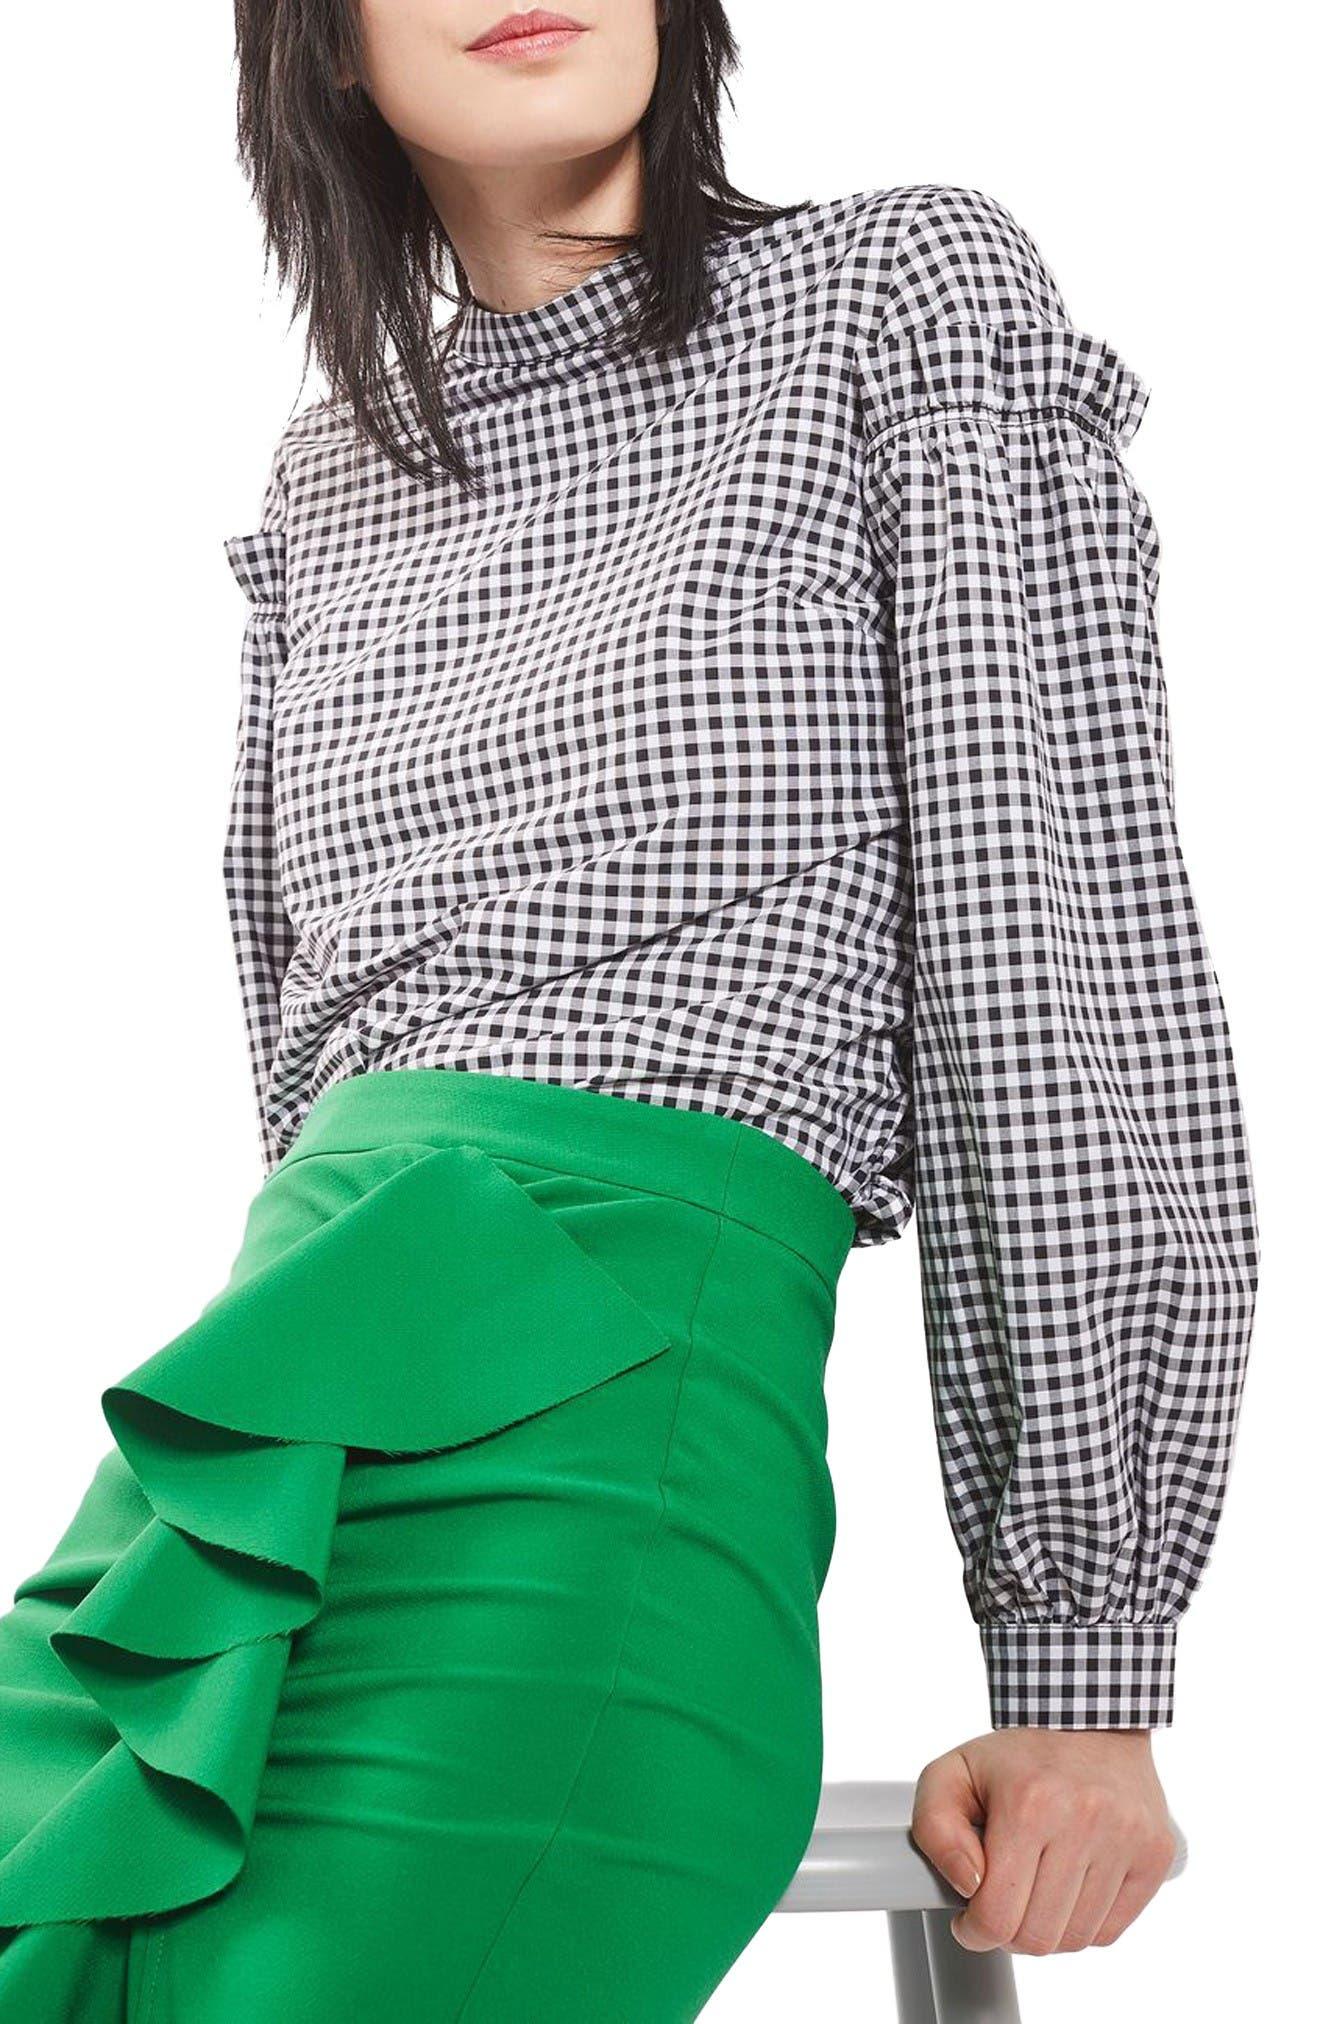 Alternate Image 1 Selected - Topshop Gingham Mutton Sleeve Top (Regular & Petite)